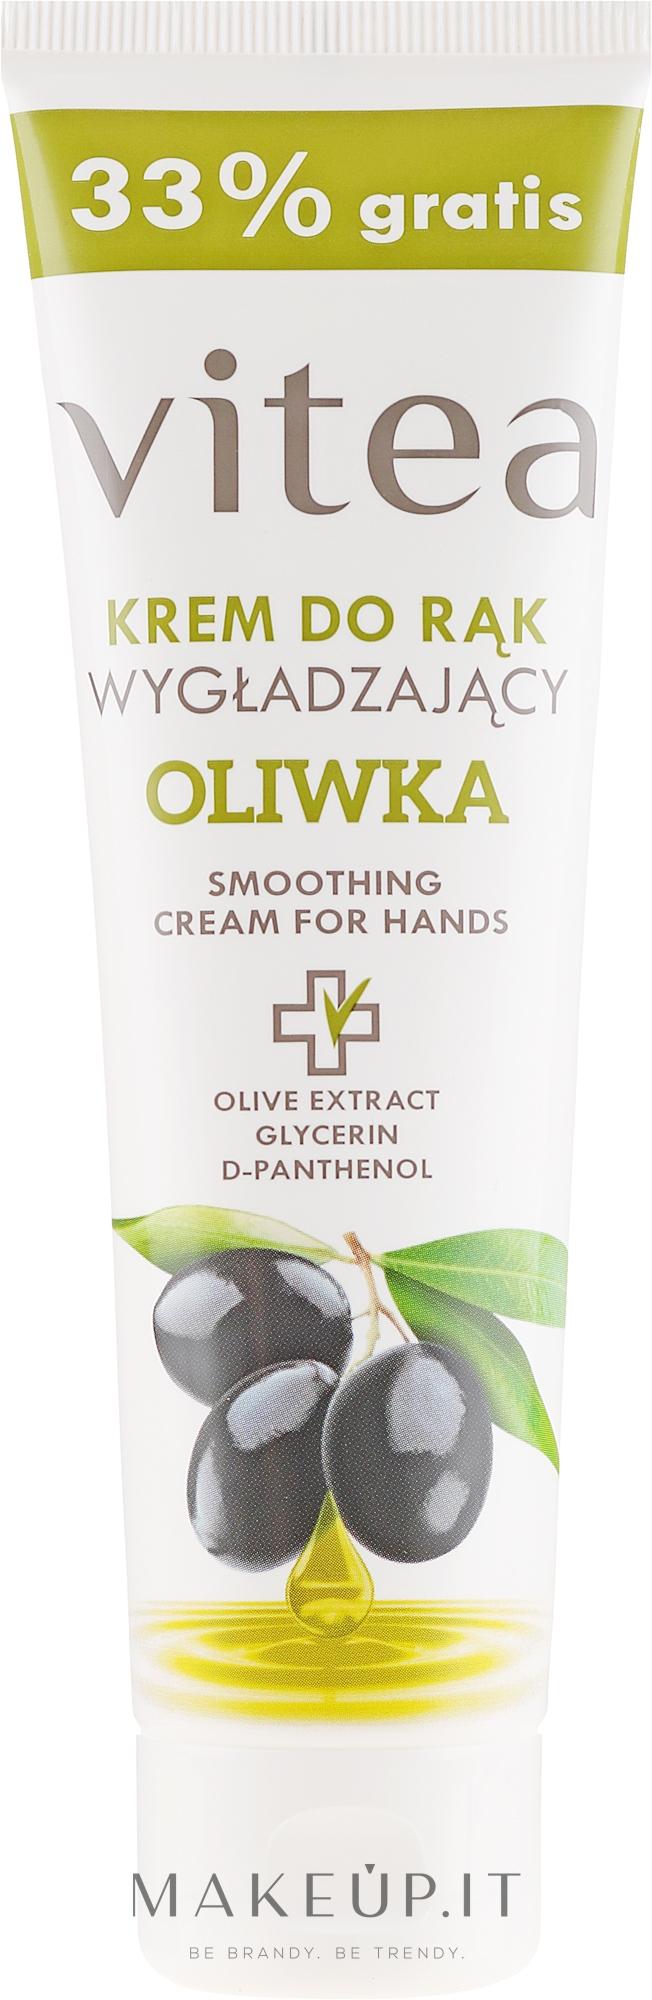 Crema mani levigante con olio d'oliva - Vitea Moisturizing Hand Cream Olive Oil — foto 100 ml